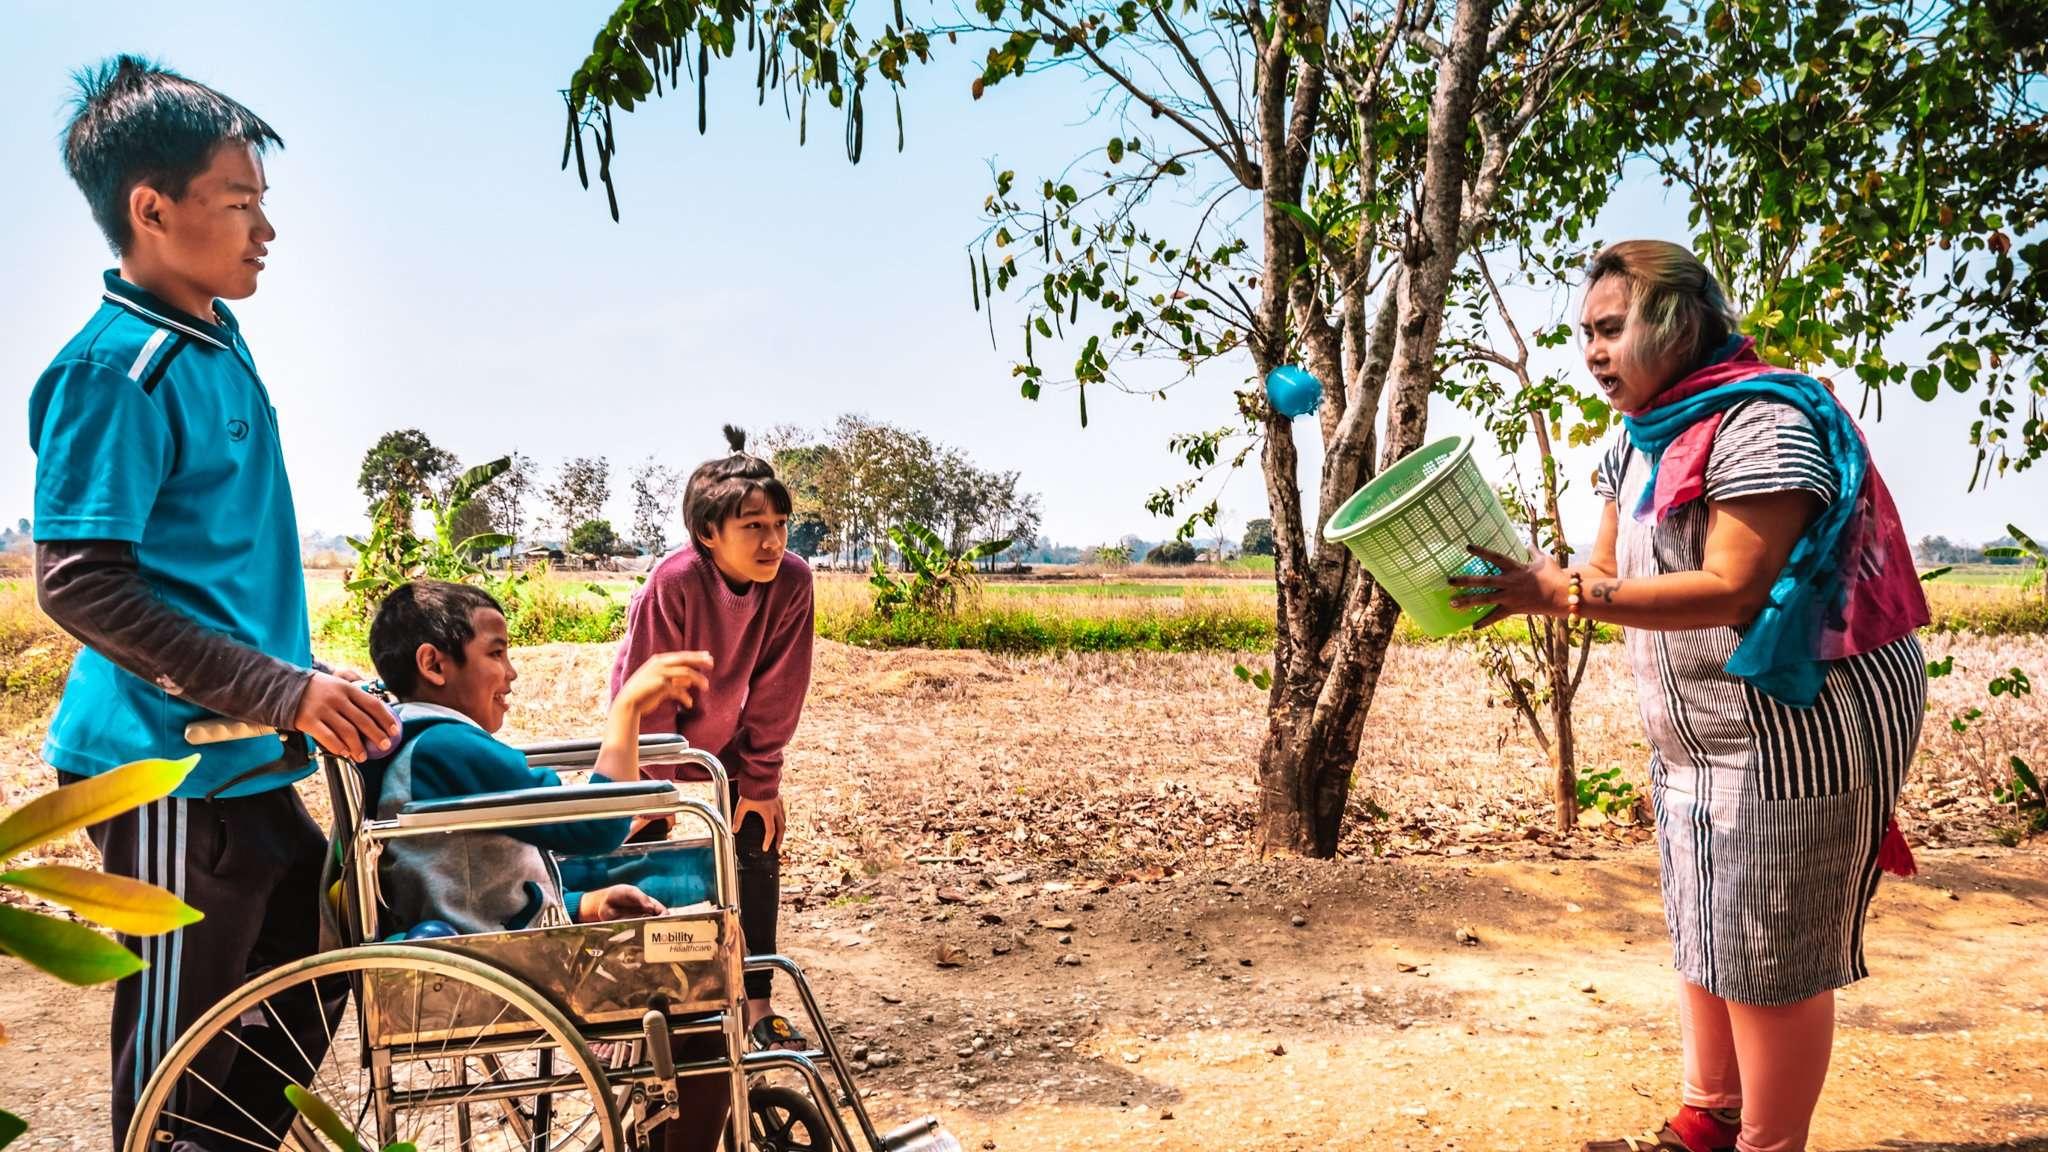 Krunam playing ball games with three children in Thailand